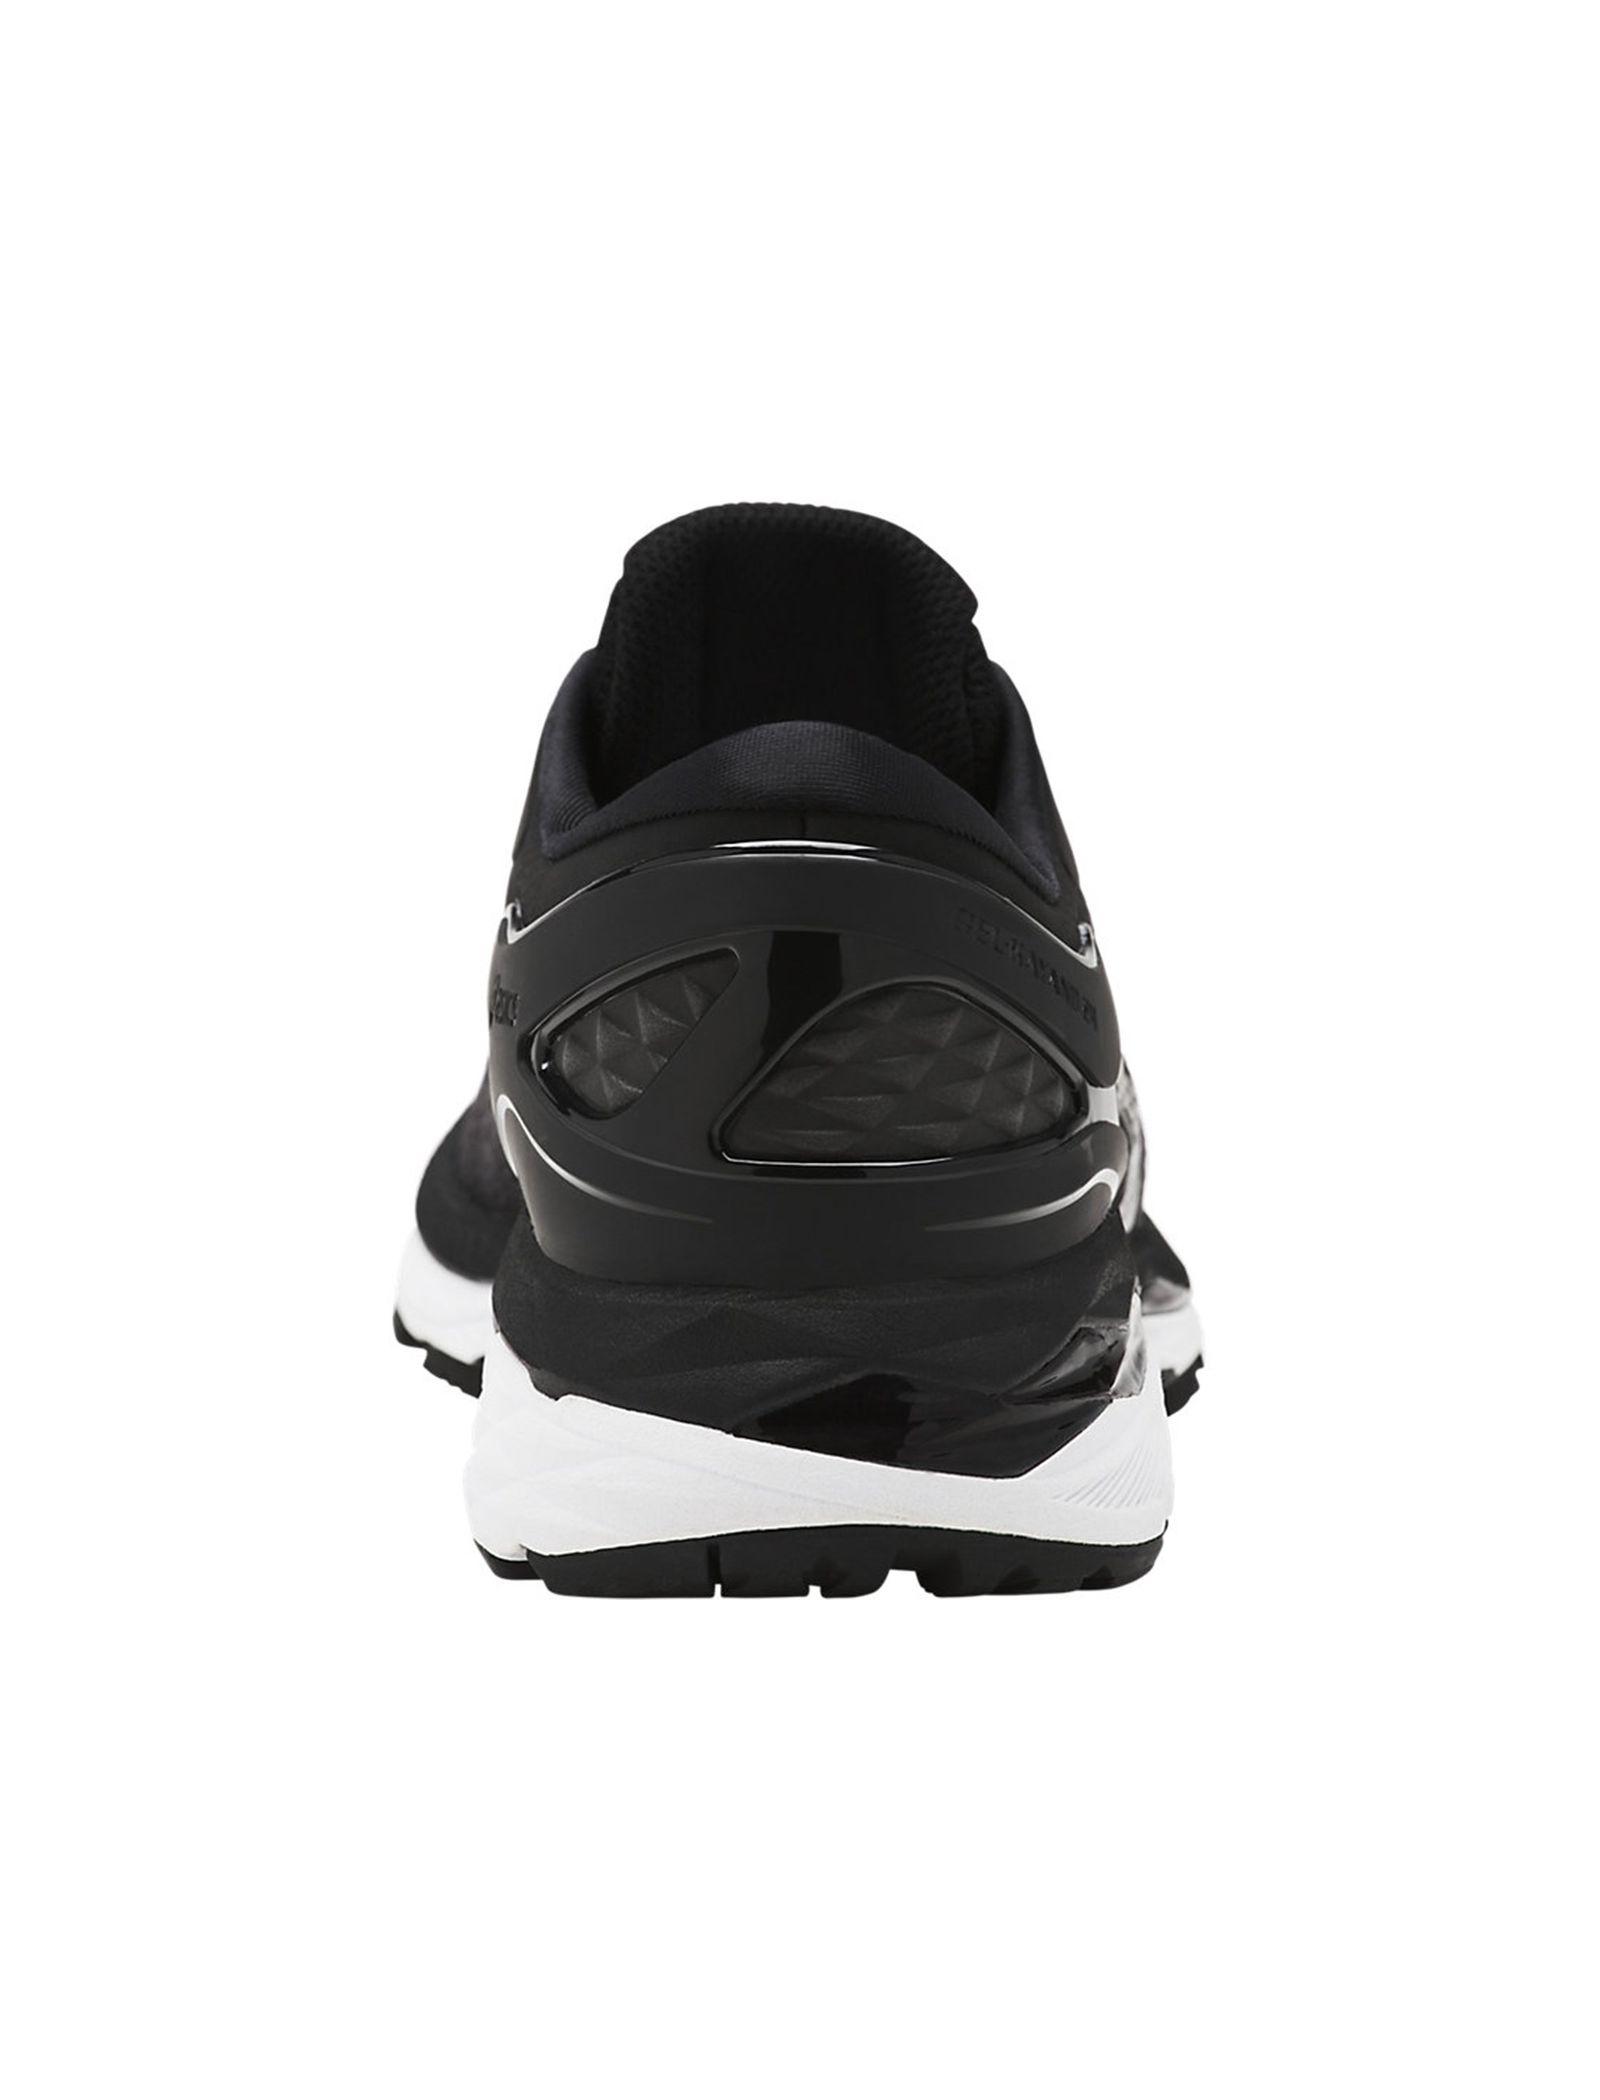 کفش دویدن بندی زنانه GEL-KAYANO 24 - اسیکس - مشکي - 4